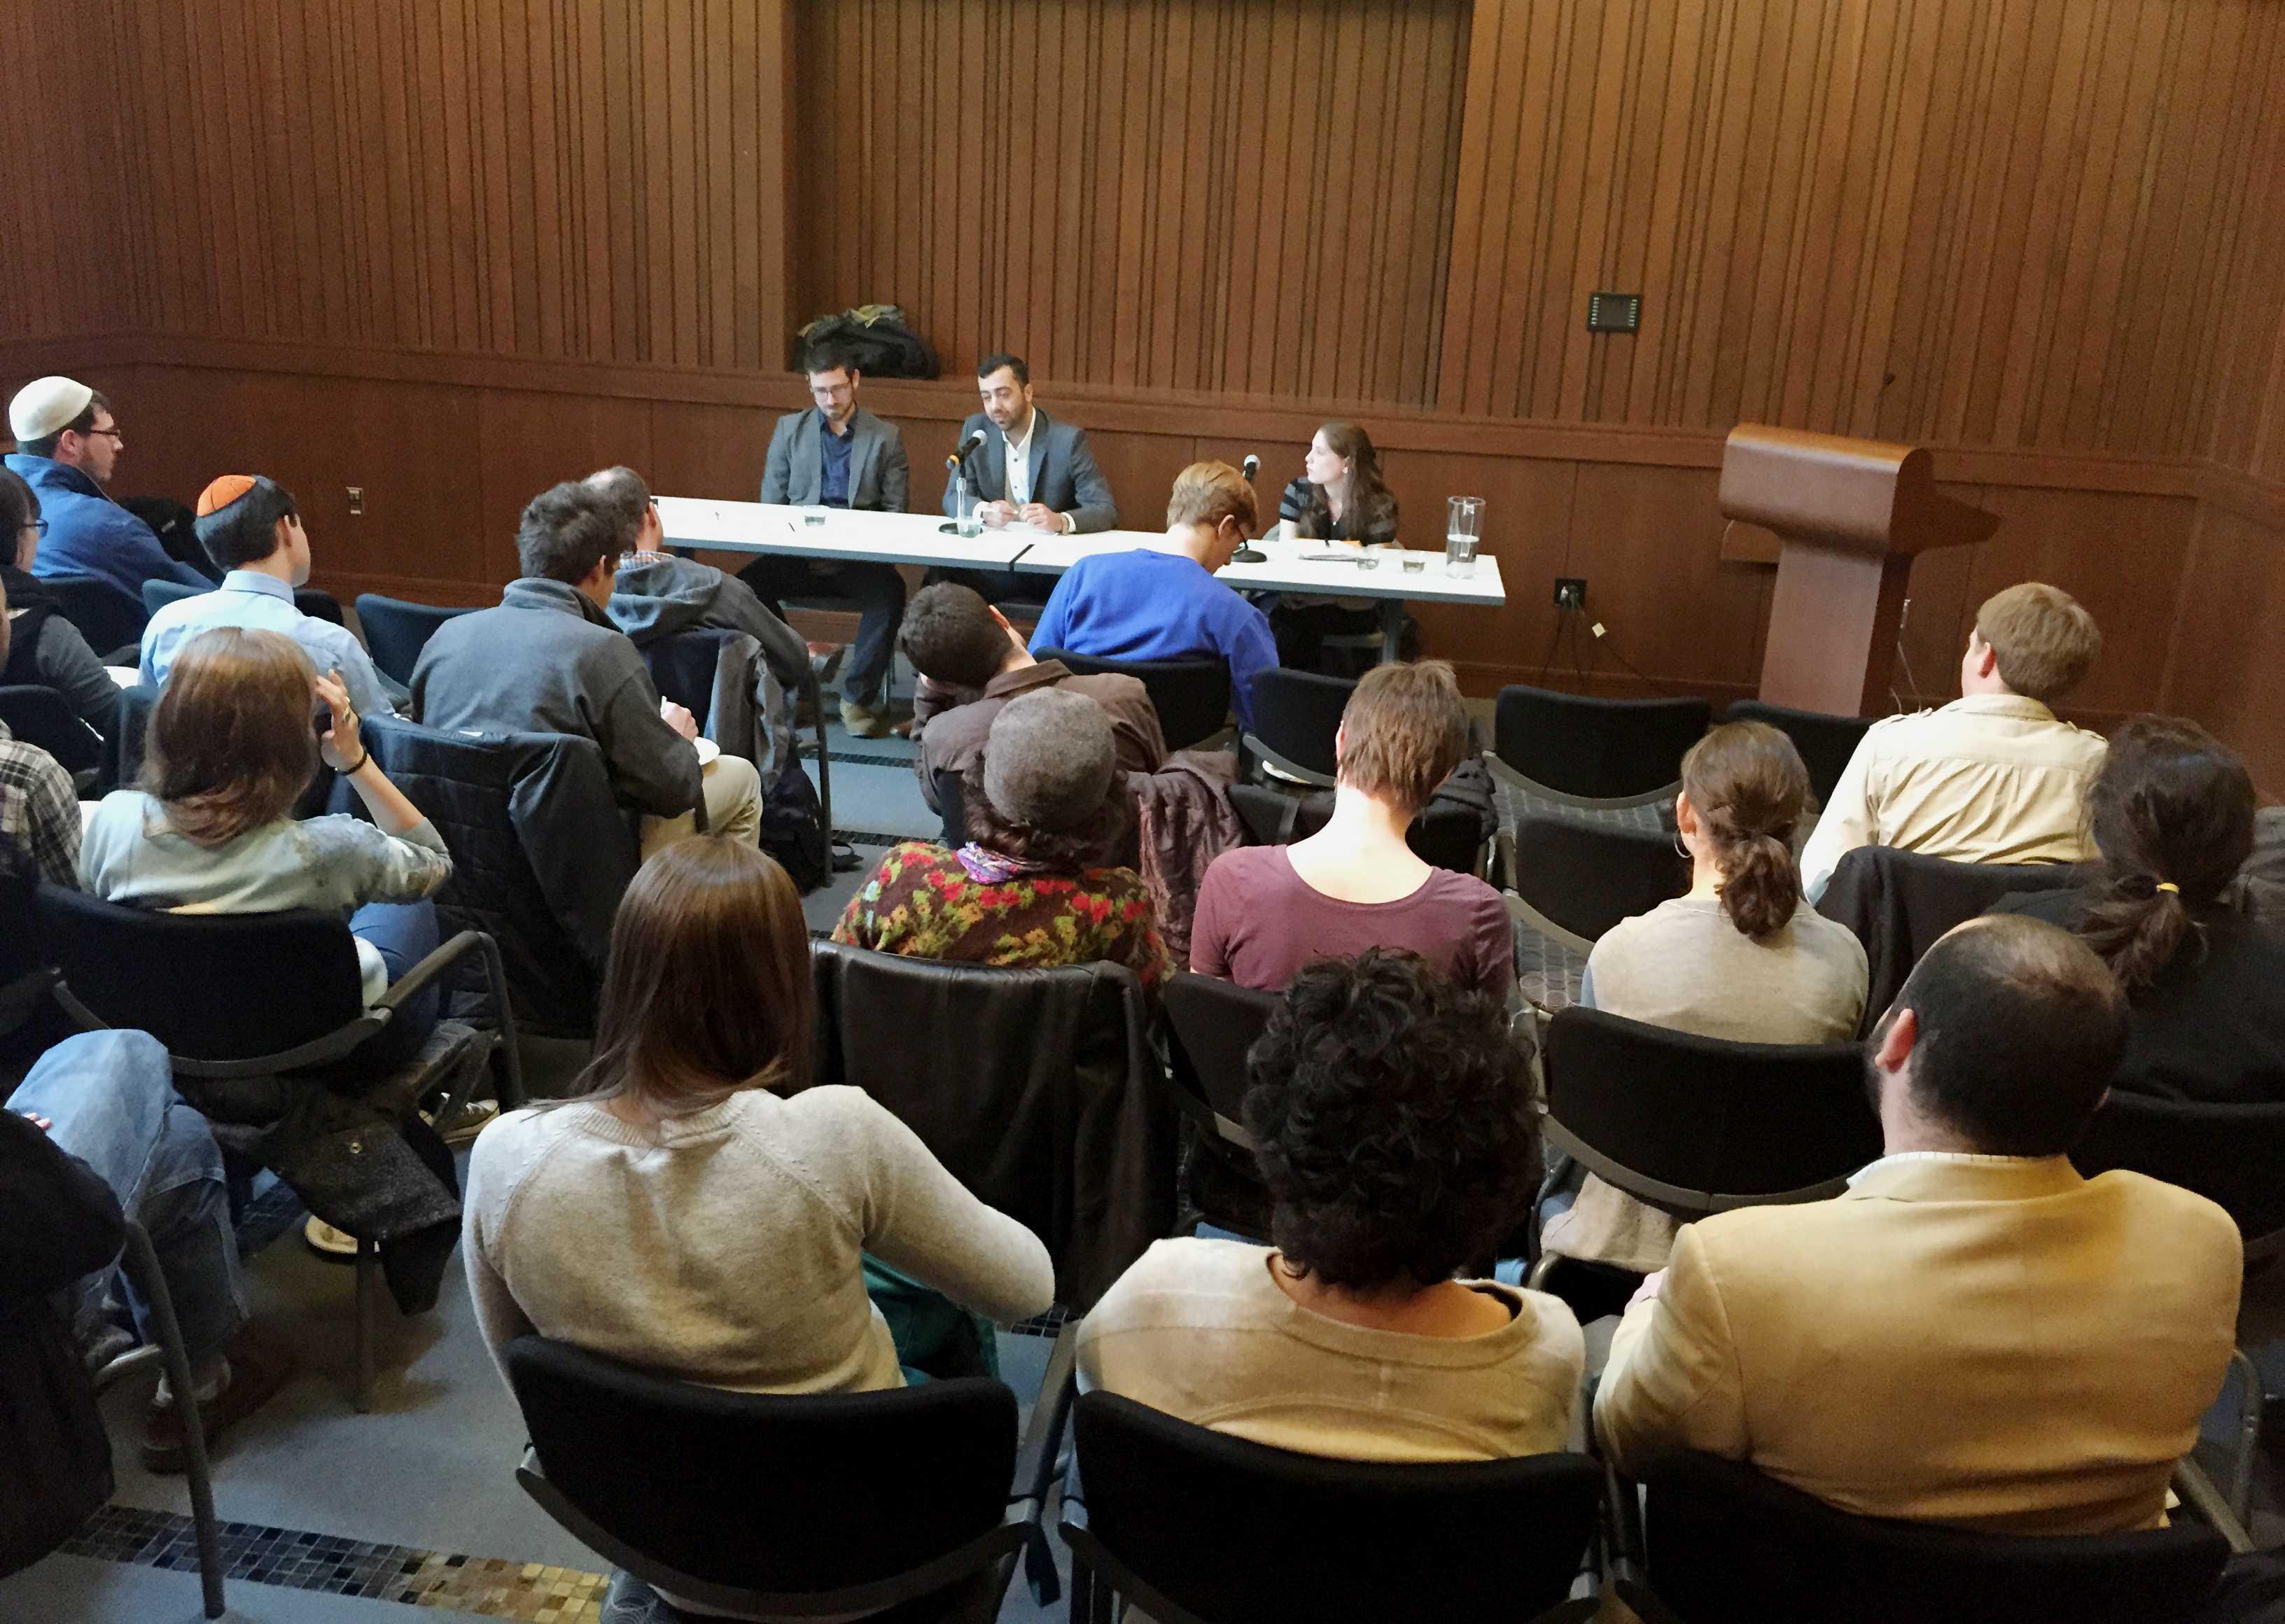 'Difficult Conversations' event held despite MacSUPER's exclusion